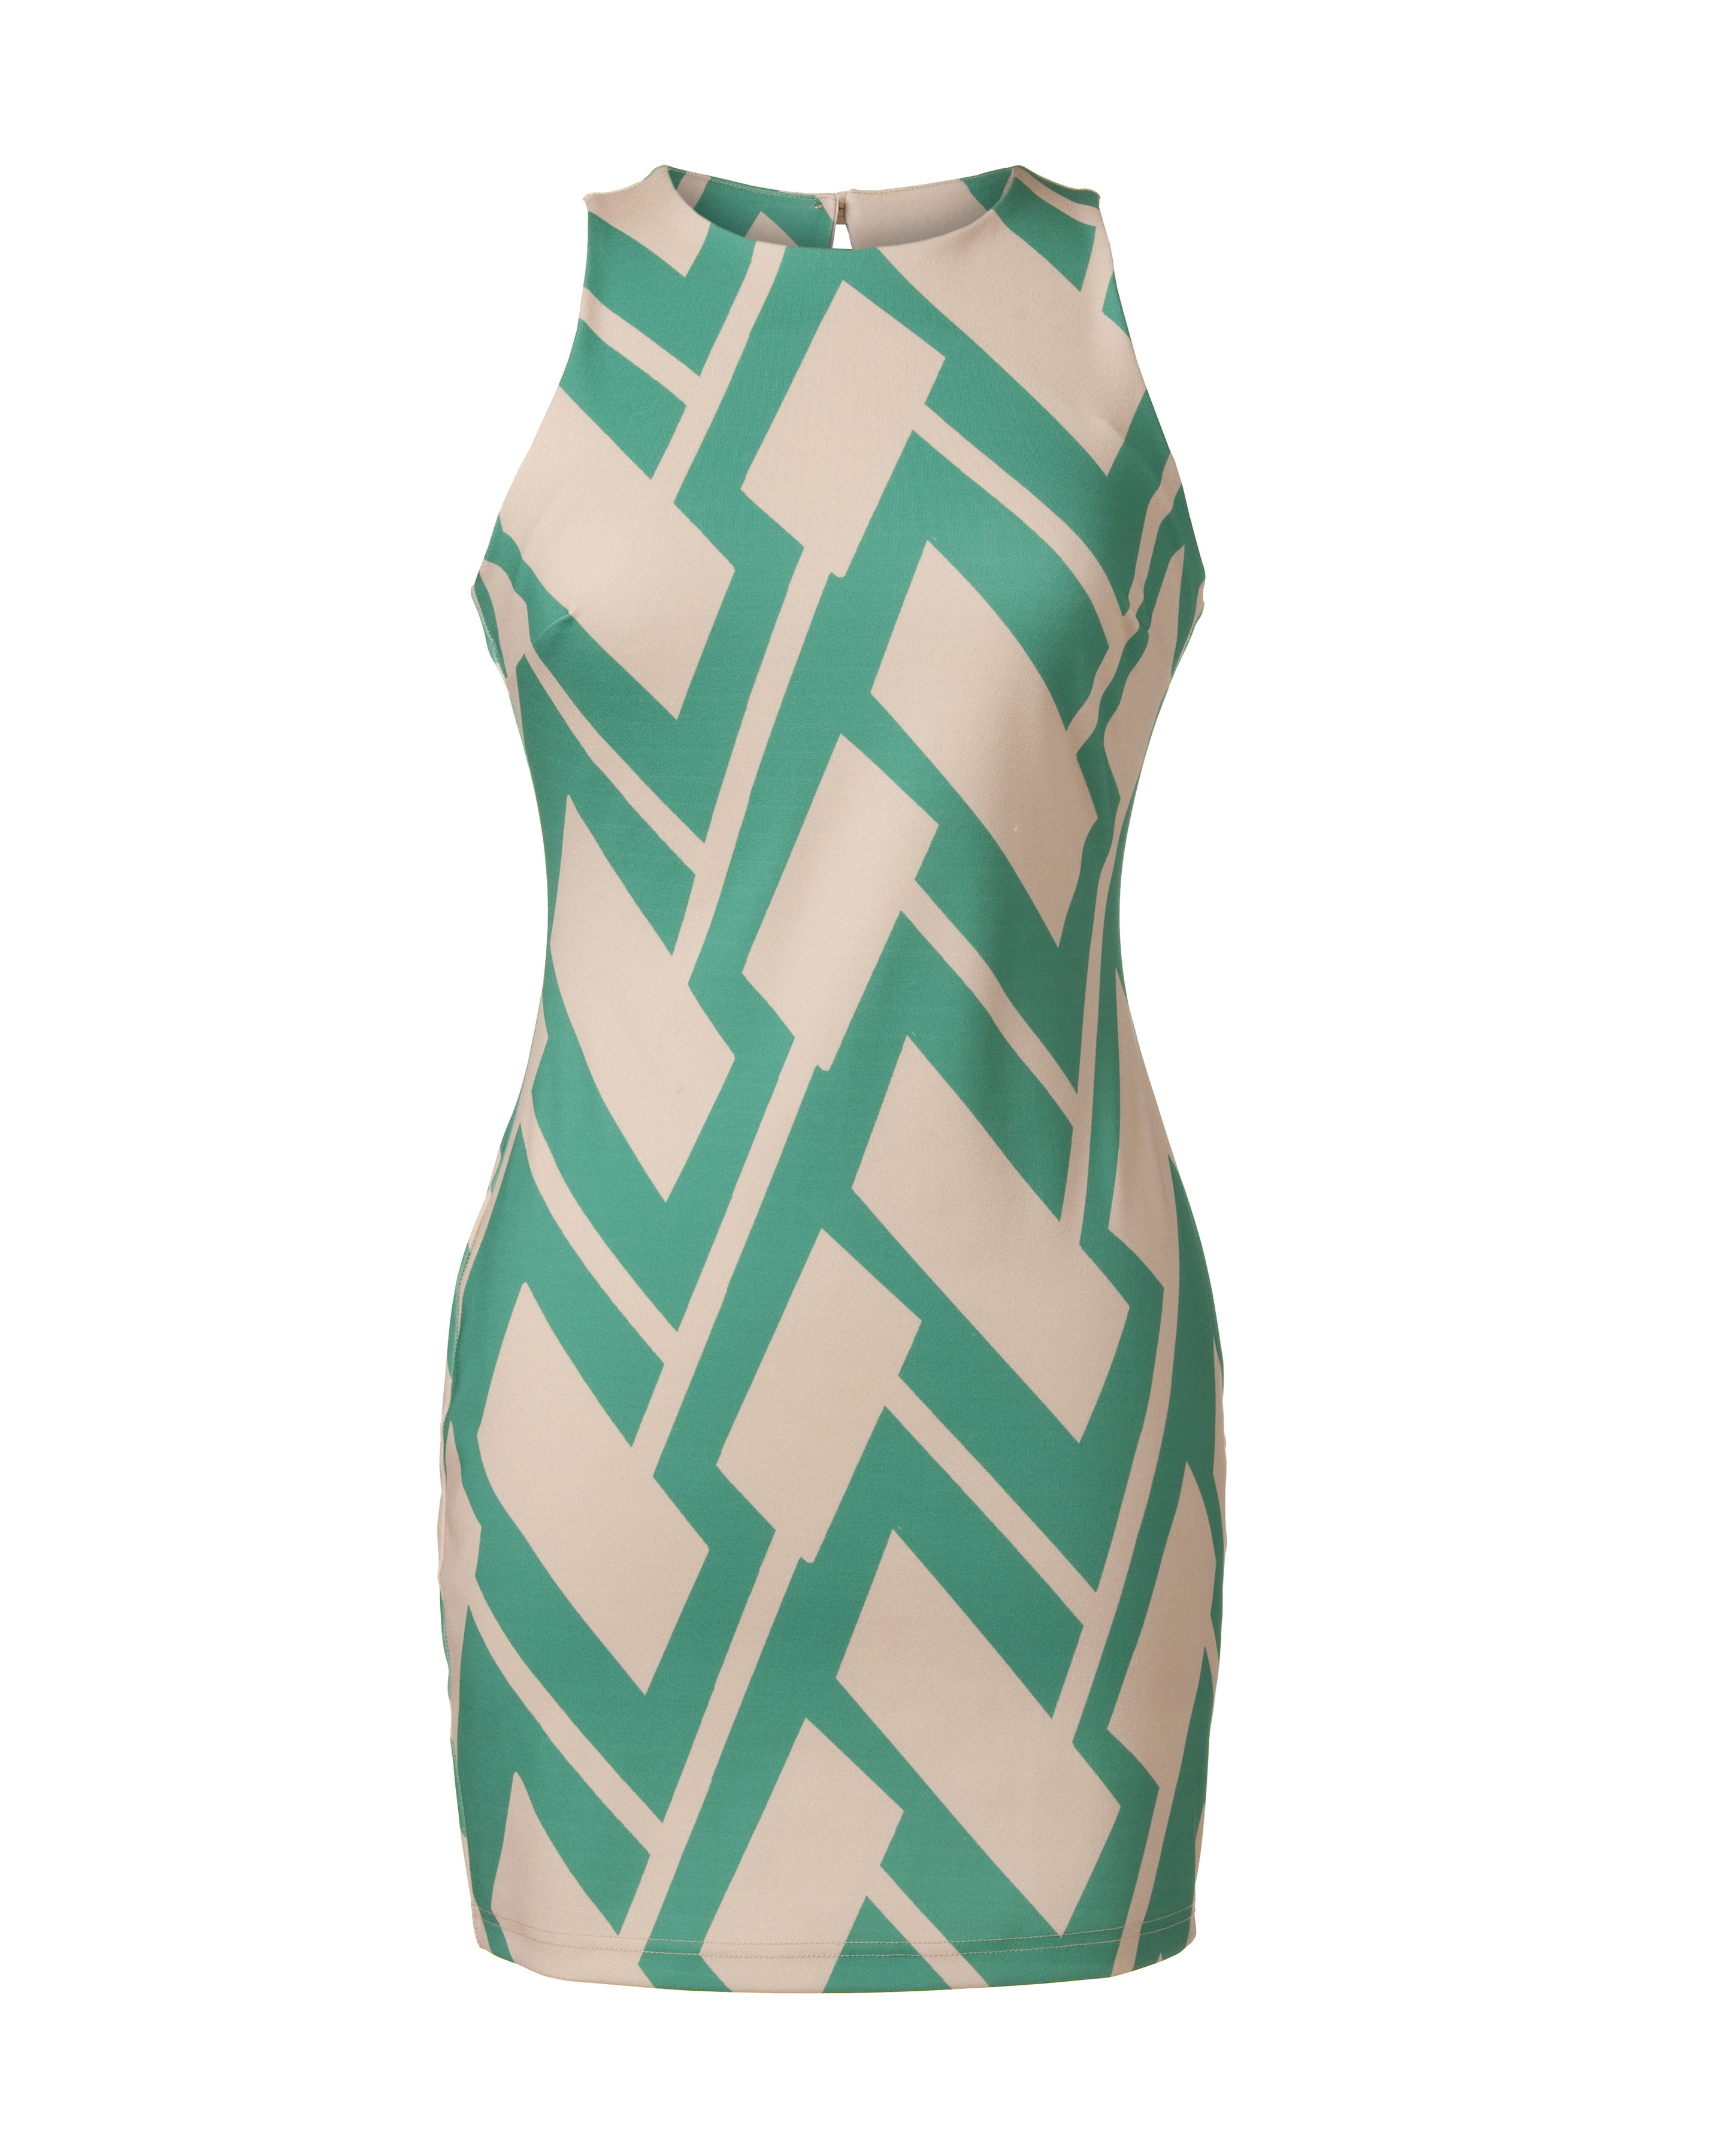 1926 Print Art Deco Fashion French Couture Dress Berthe - Art Deco